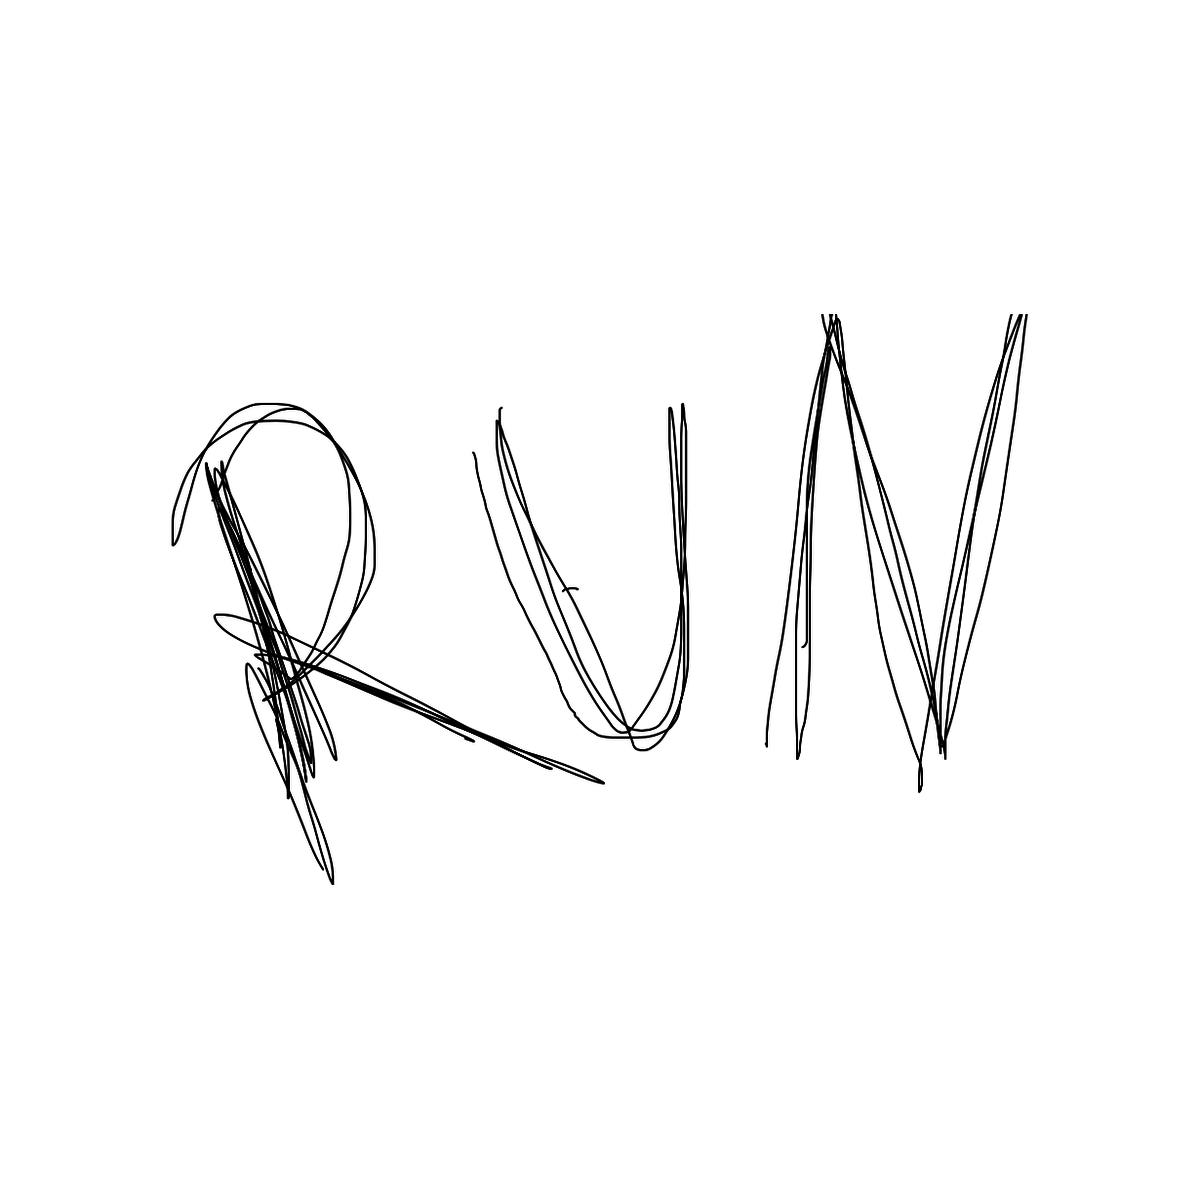 BAAAM drawing#22864 lat:47.2371673583984400lng: -93.5302124023437500